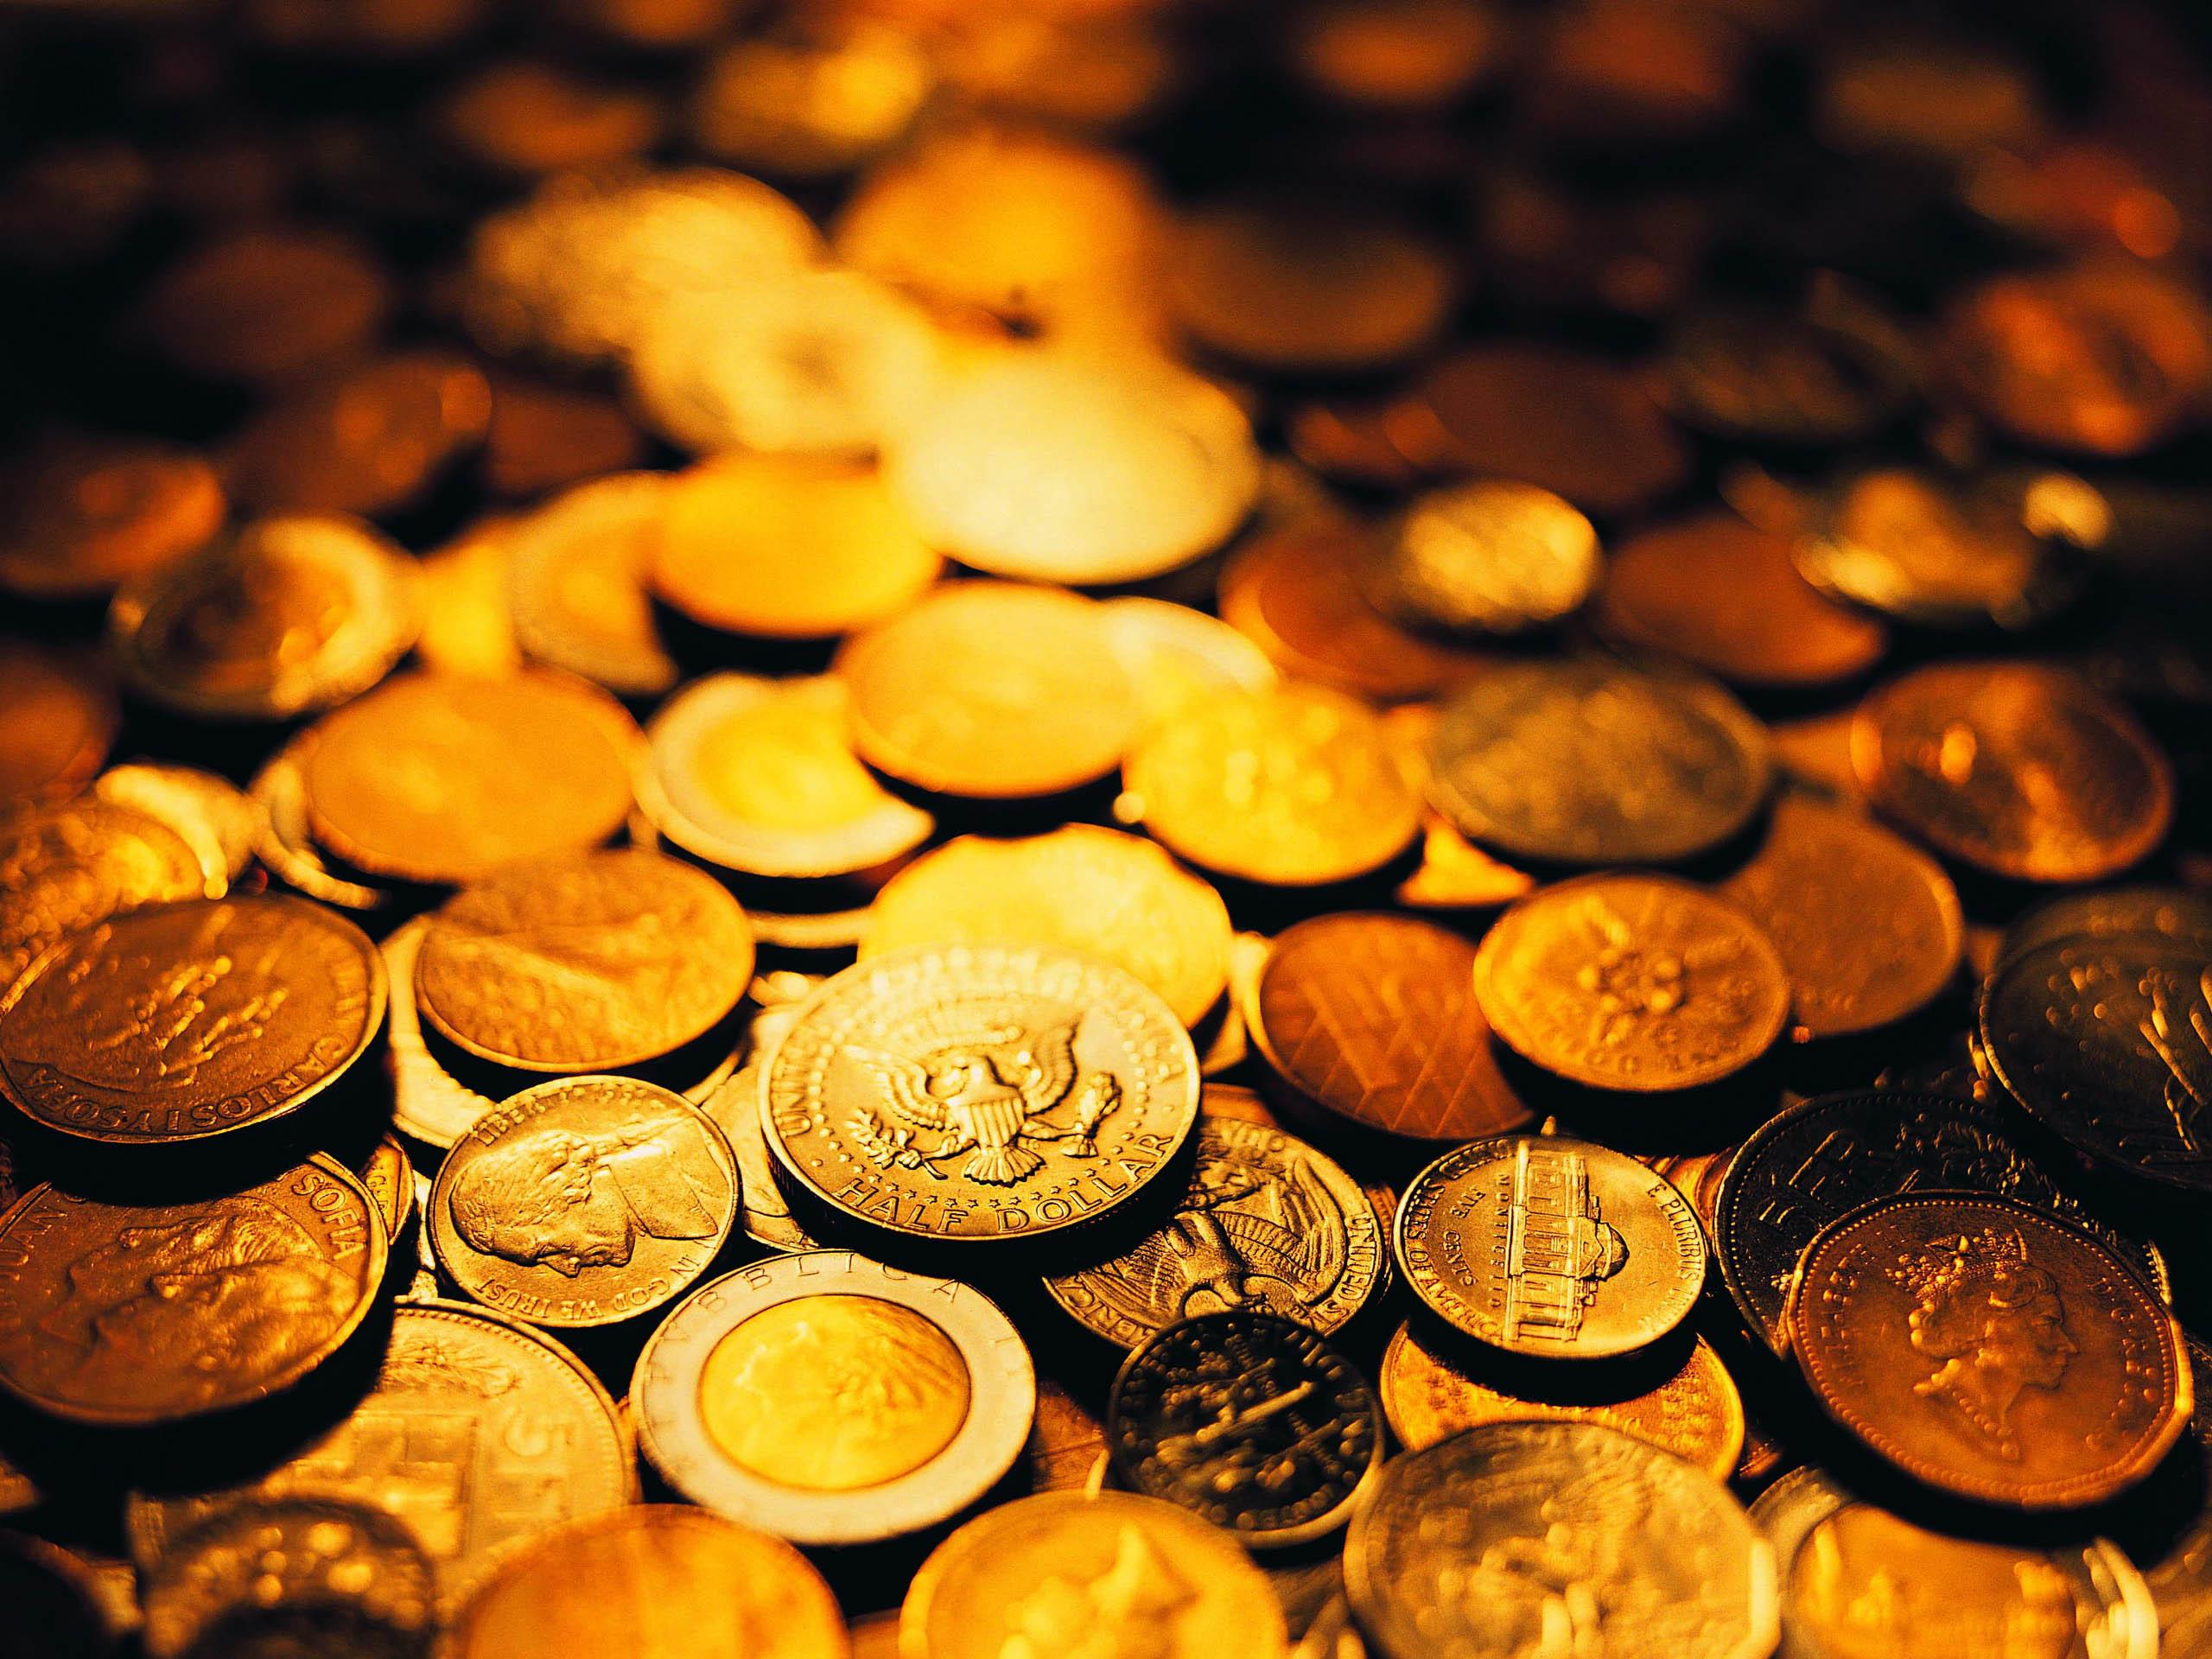 Картинка money (146) - Картинки Деньги - Бесплатные ...: http://pictar.ru/img-money-146-25889.htm